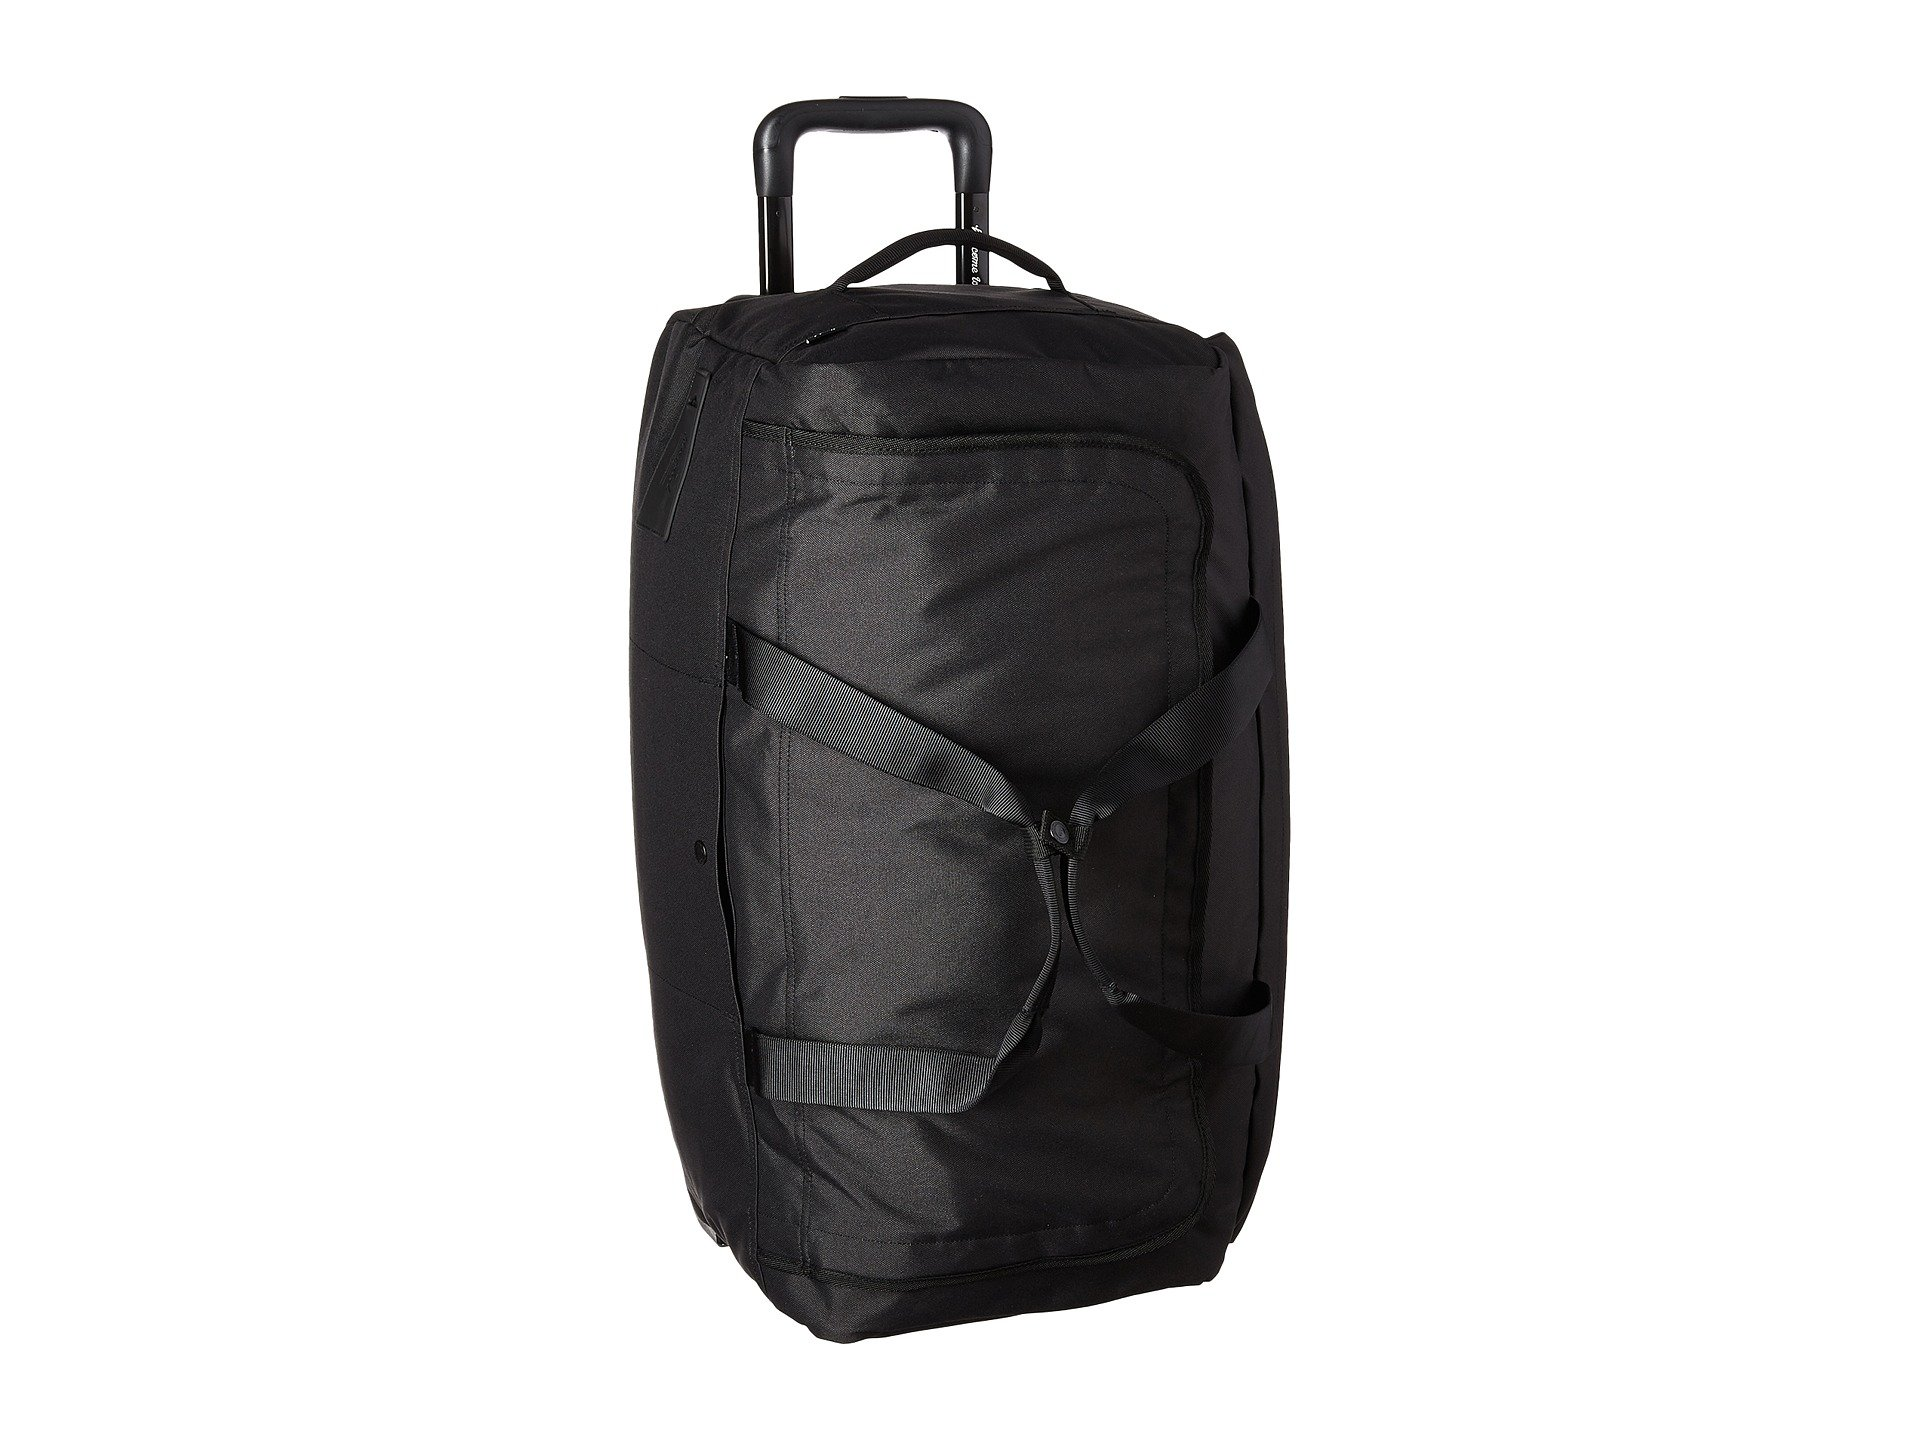 Outfitter 2 Black Co Wheelie Herschel Supply qw8tPSS